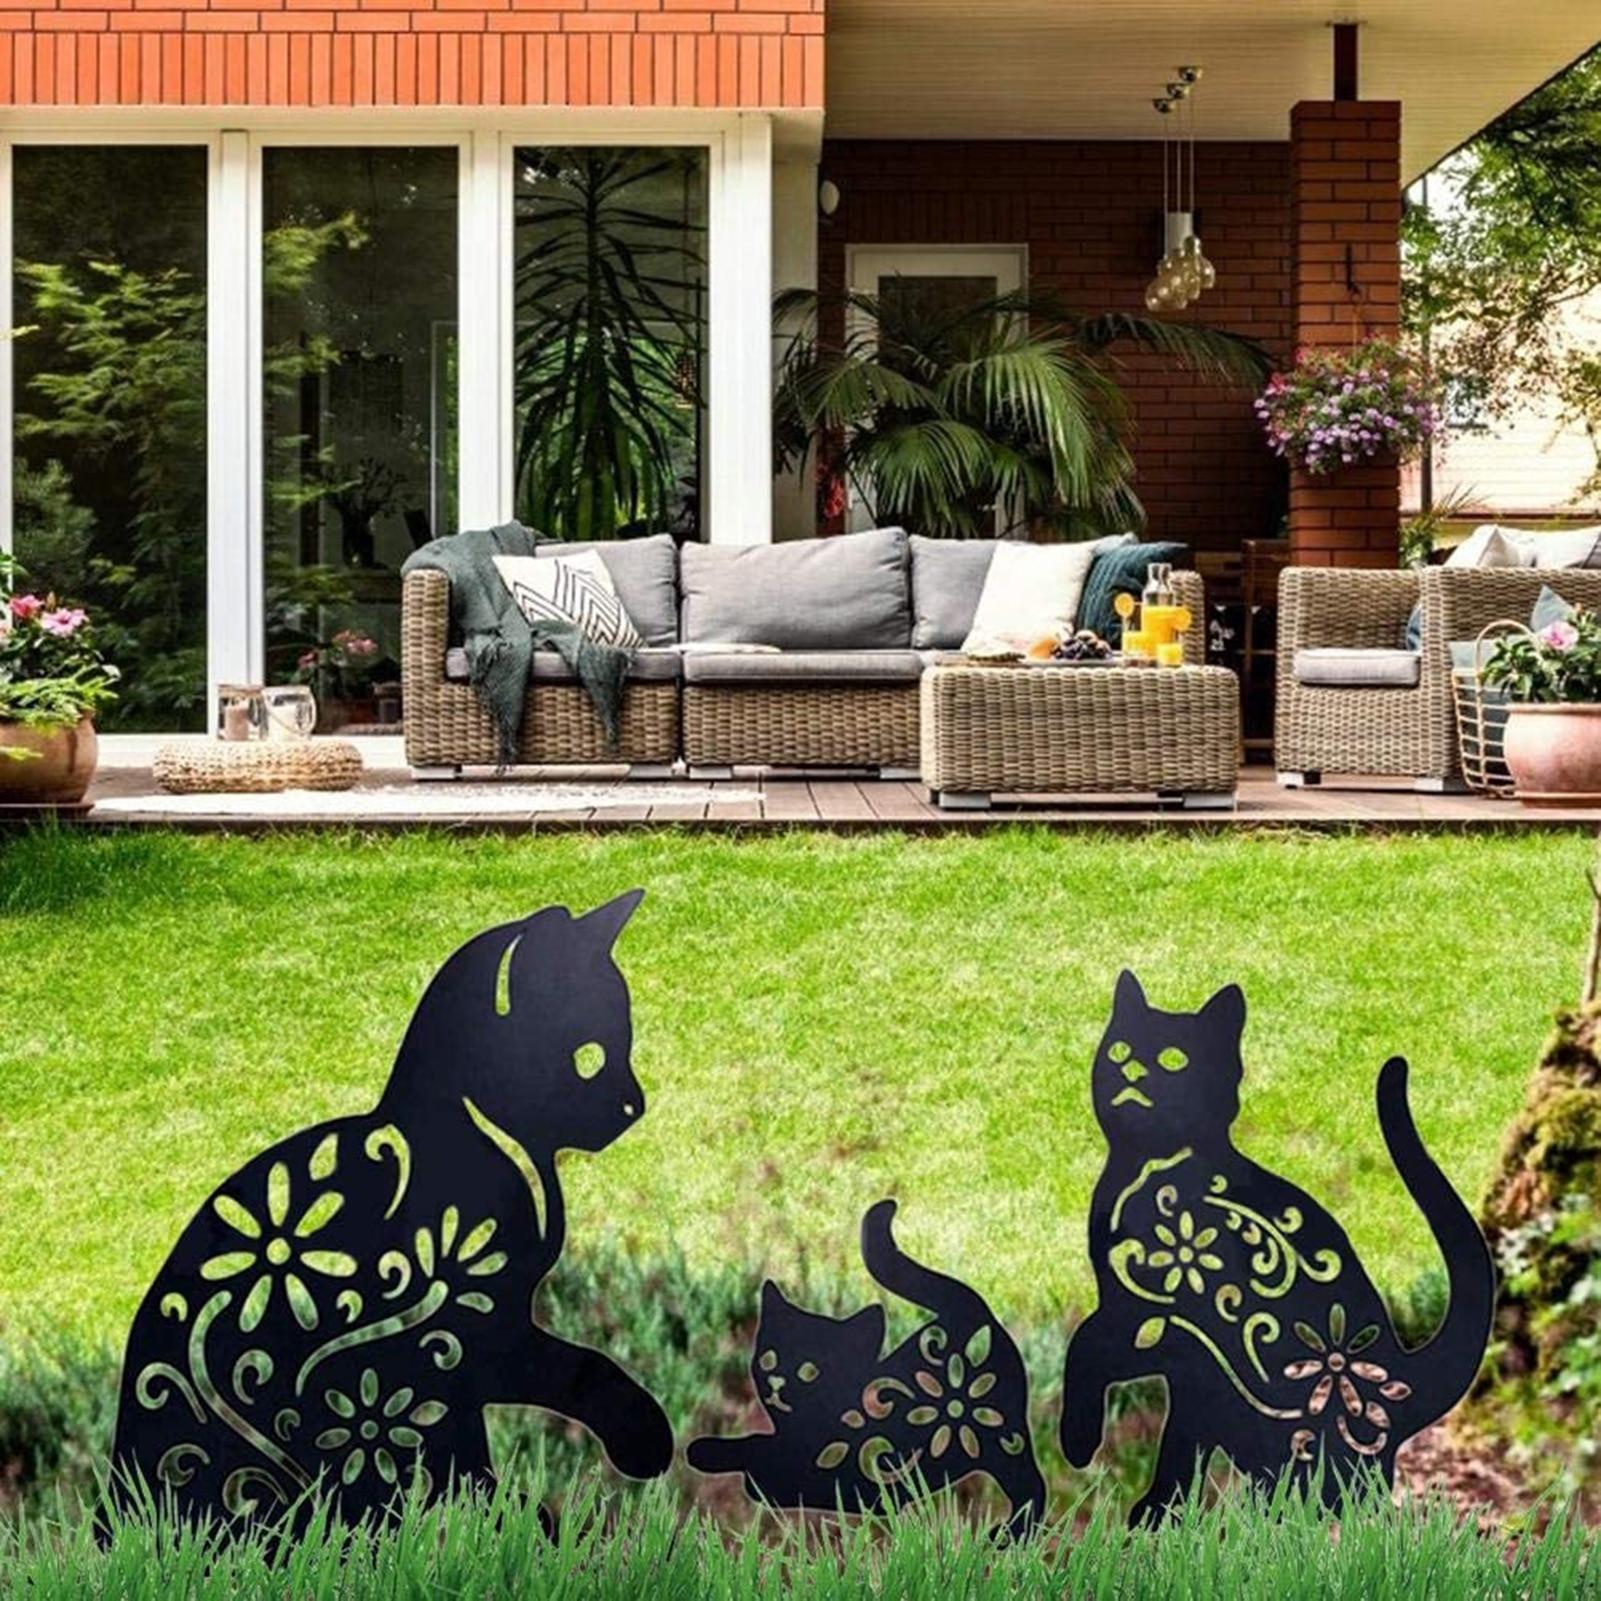 2D القط الشكل إدراج الأرض ديكور الجوف نابض بالحياة هريرة معدنية تمثال الوتد للخارجية حديقة مانور الحديقة السوداء I88